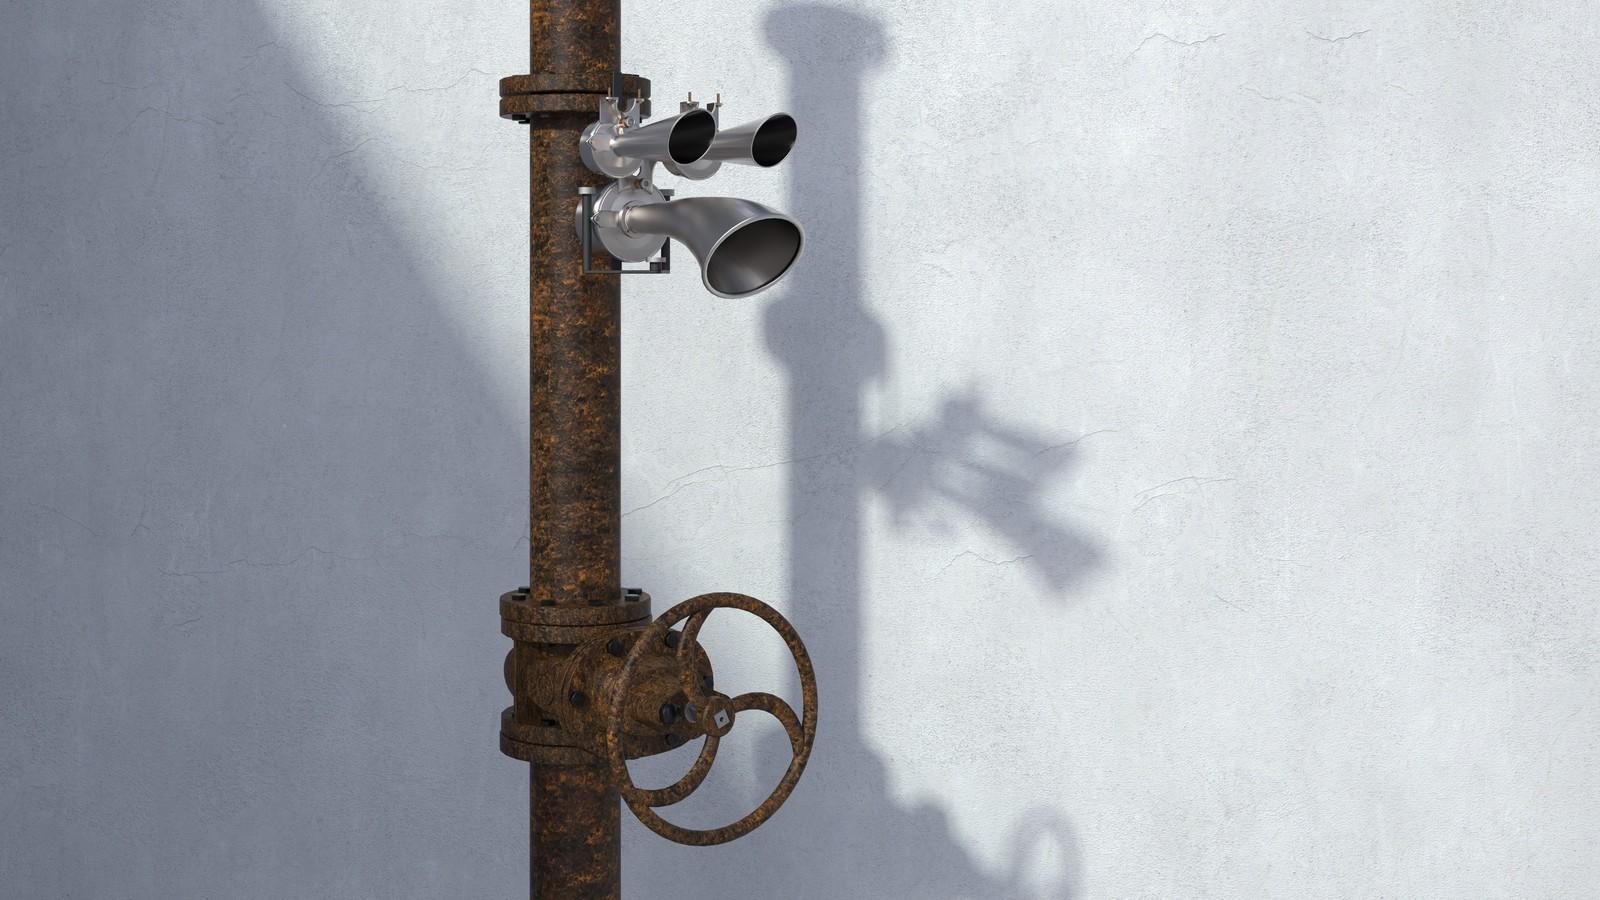 SketchUp + Thea Render  Rivendell Mill's Industrial Signal Warehouse Horn  Rivendell Horns 01 Final Scene 16